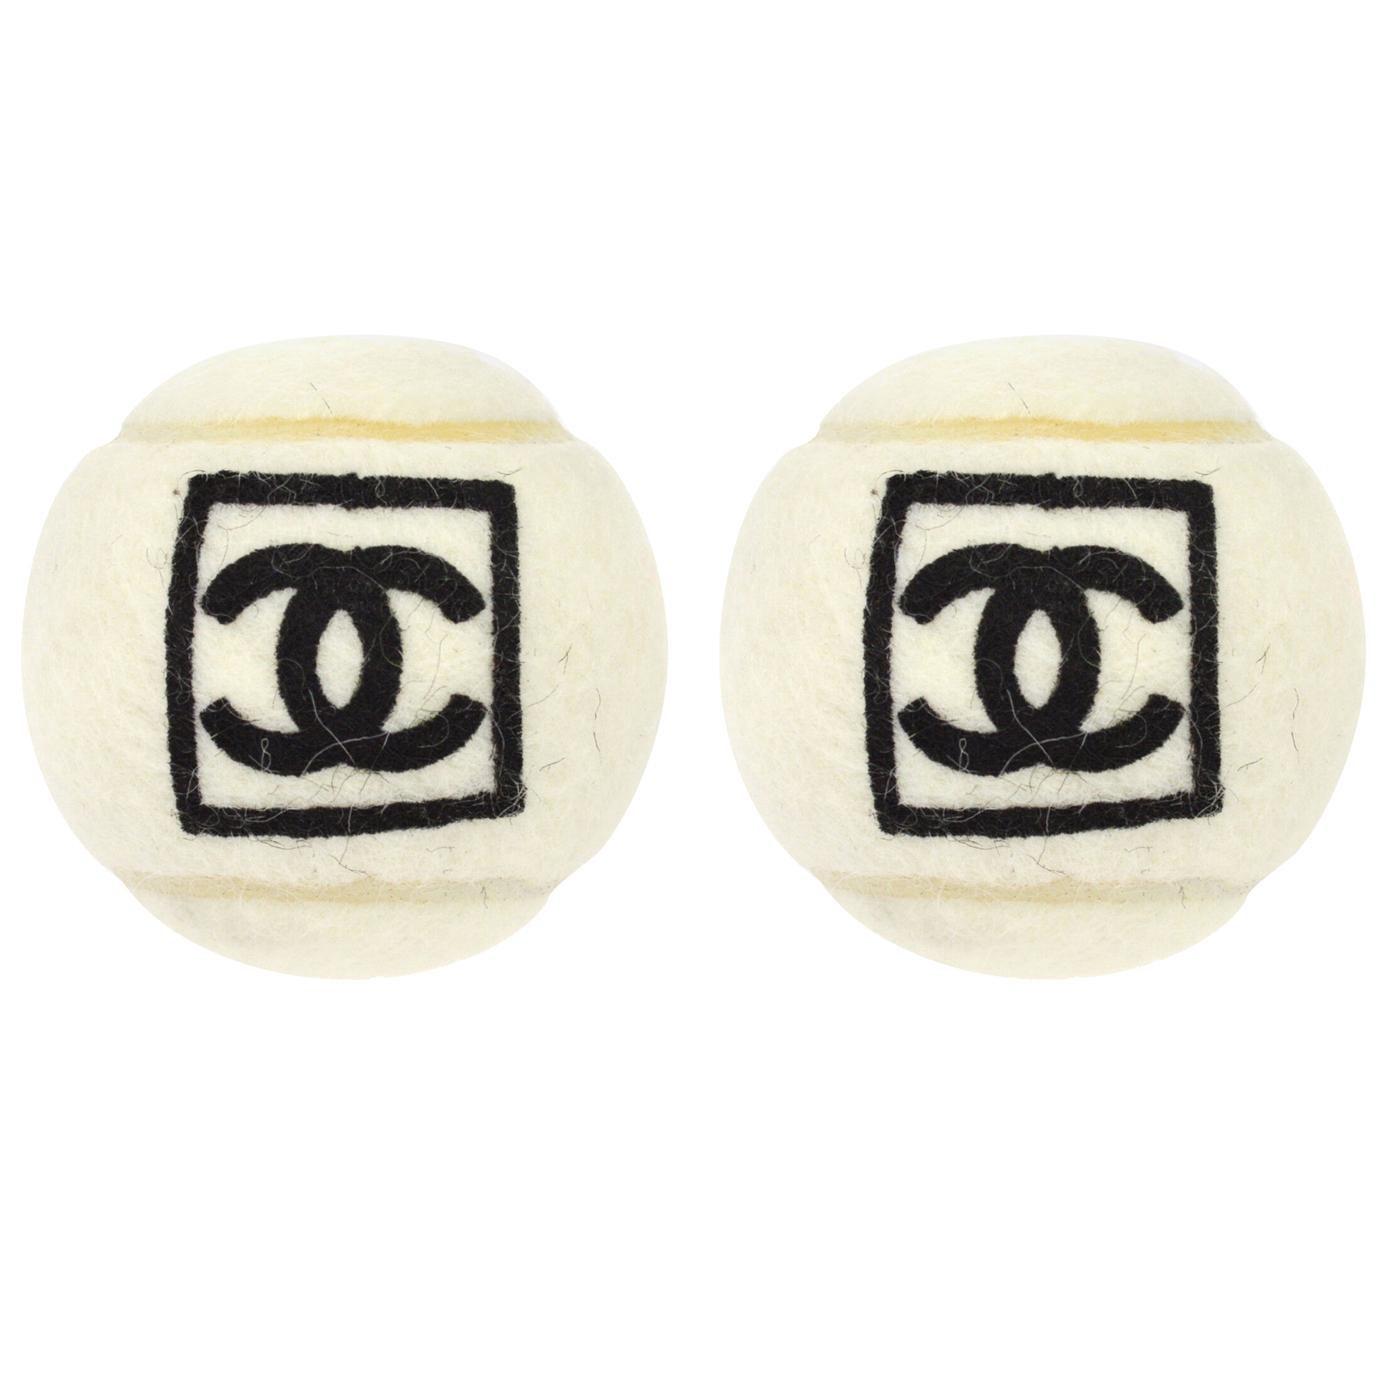 Chanel Off White Black CC Logo Sports Game Novelty Tennis Ball - A Pair (2)